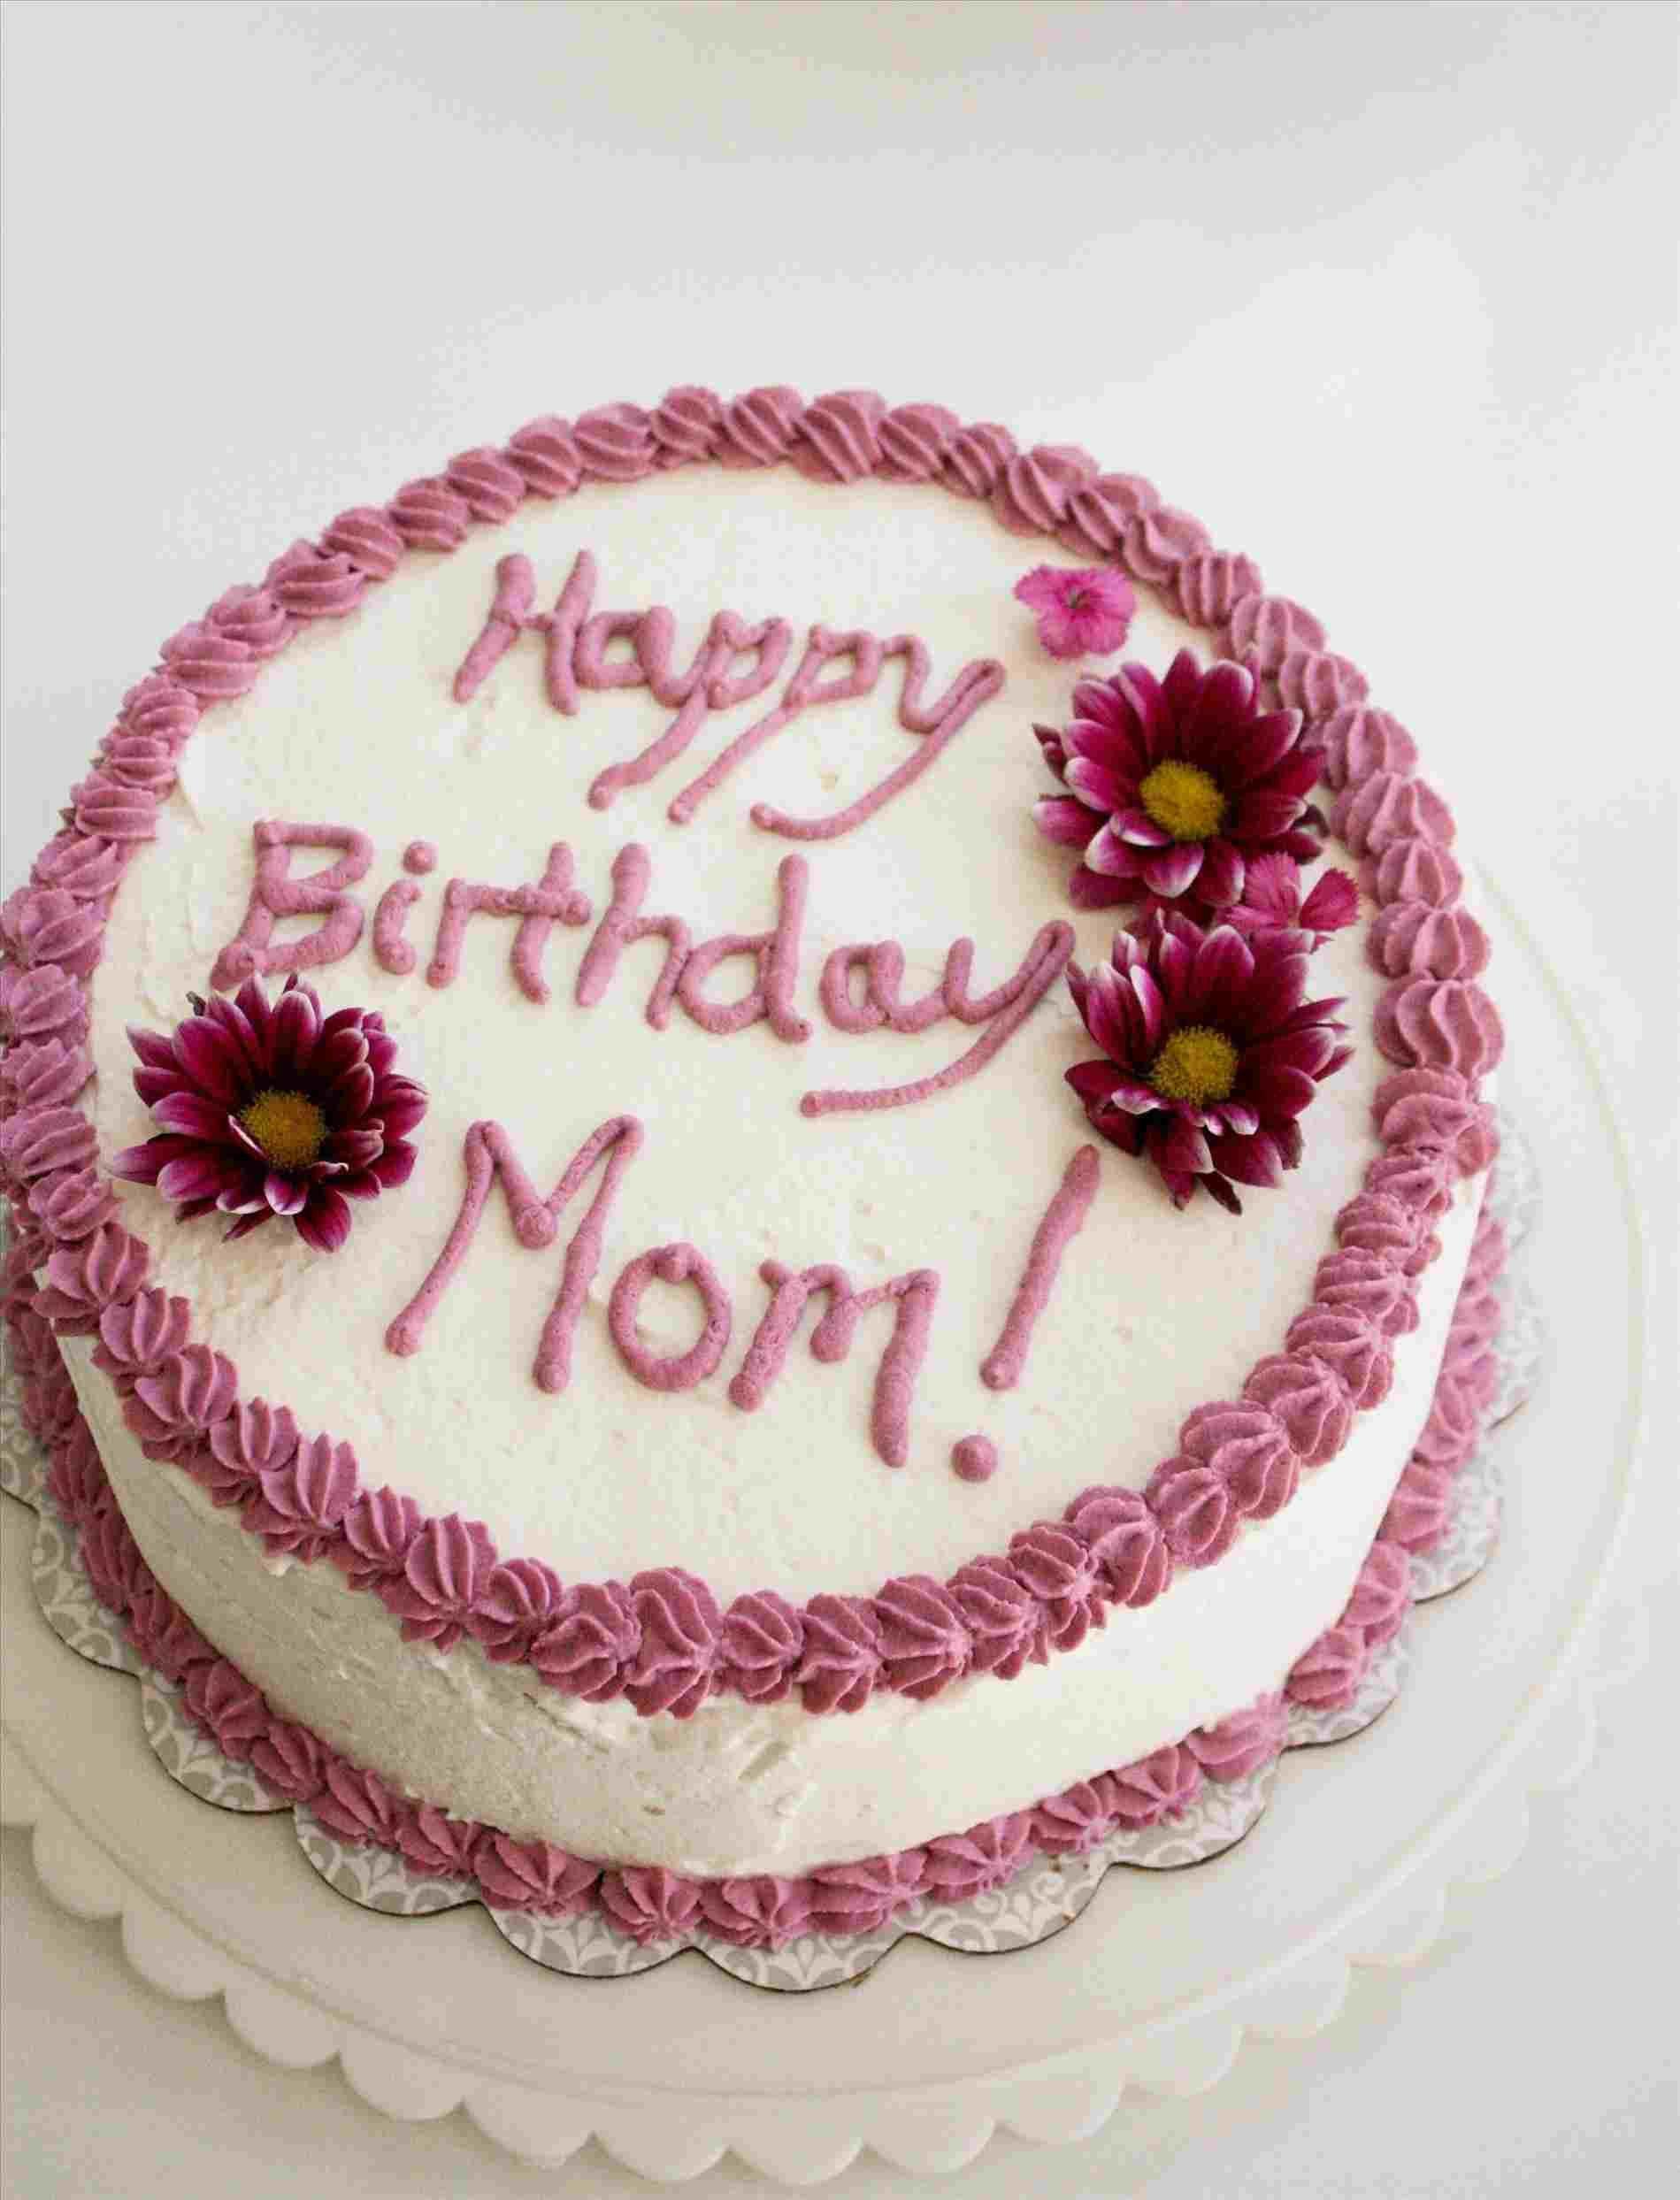 Happy Birthday Deepika Cake Birthday Cakes With Red Roses Birthday Cake For Mom New Birthday Cake Mom Cake